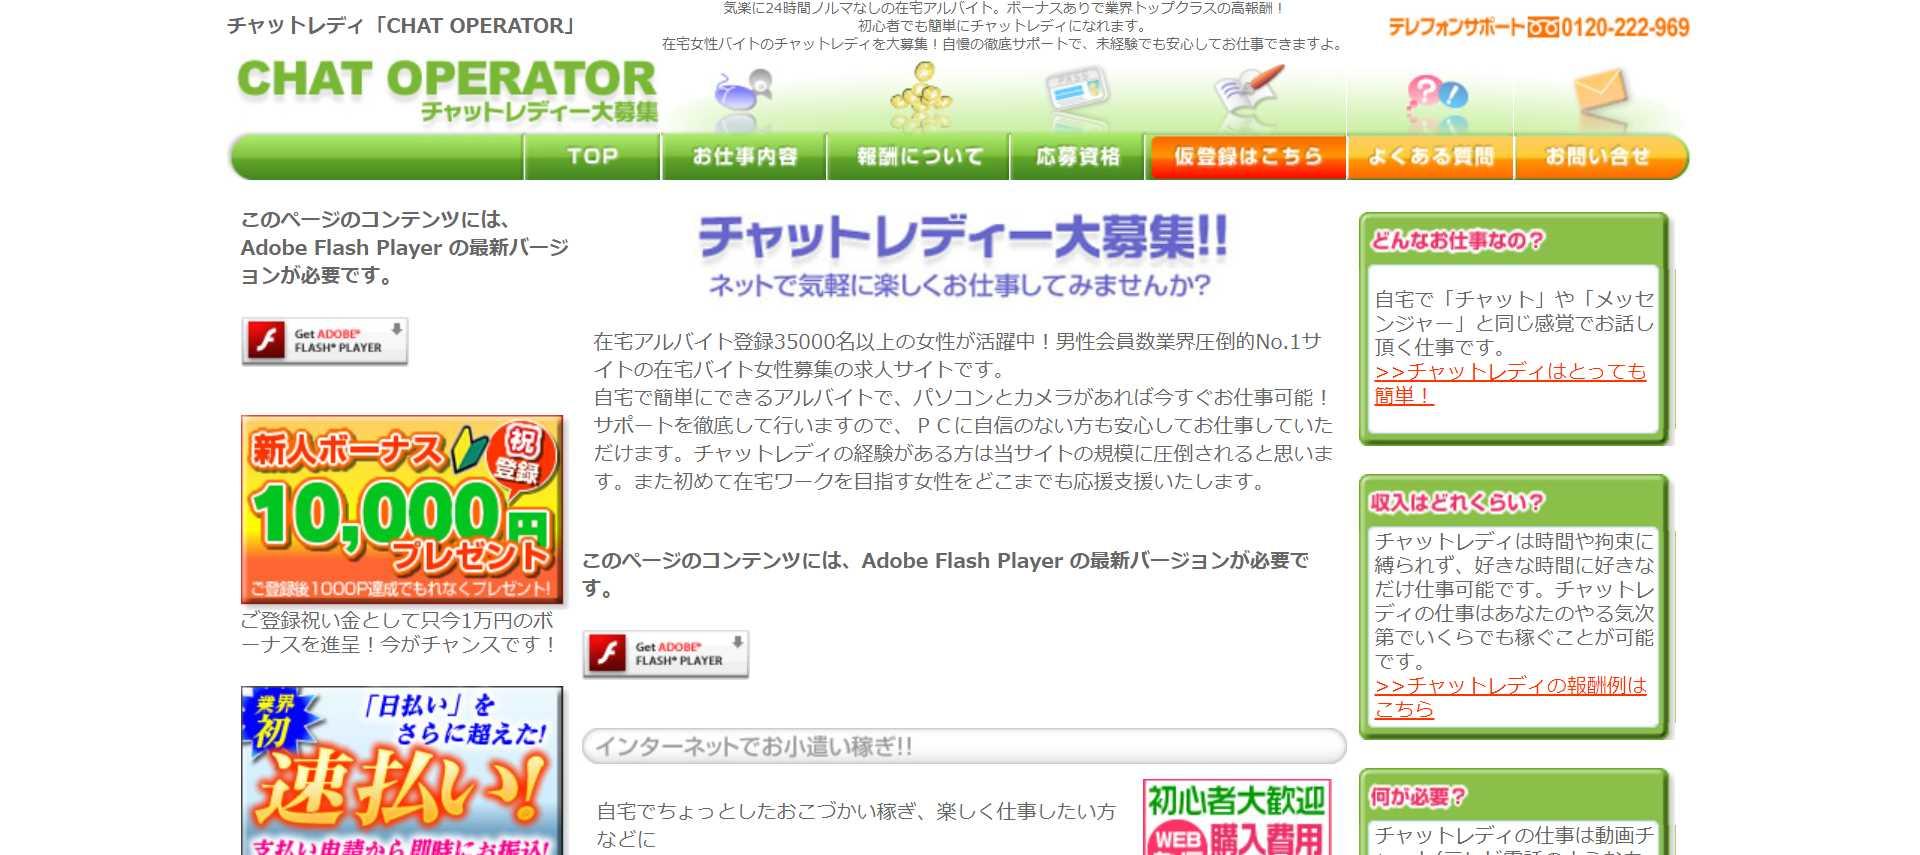 BBchatTVトップページ